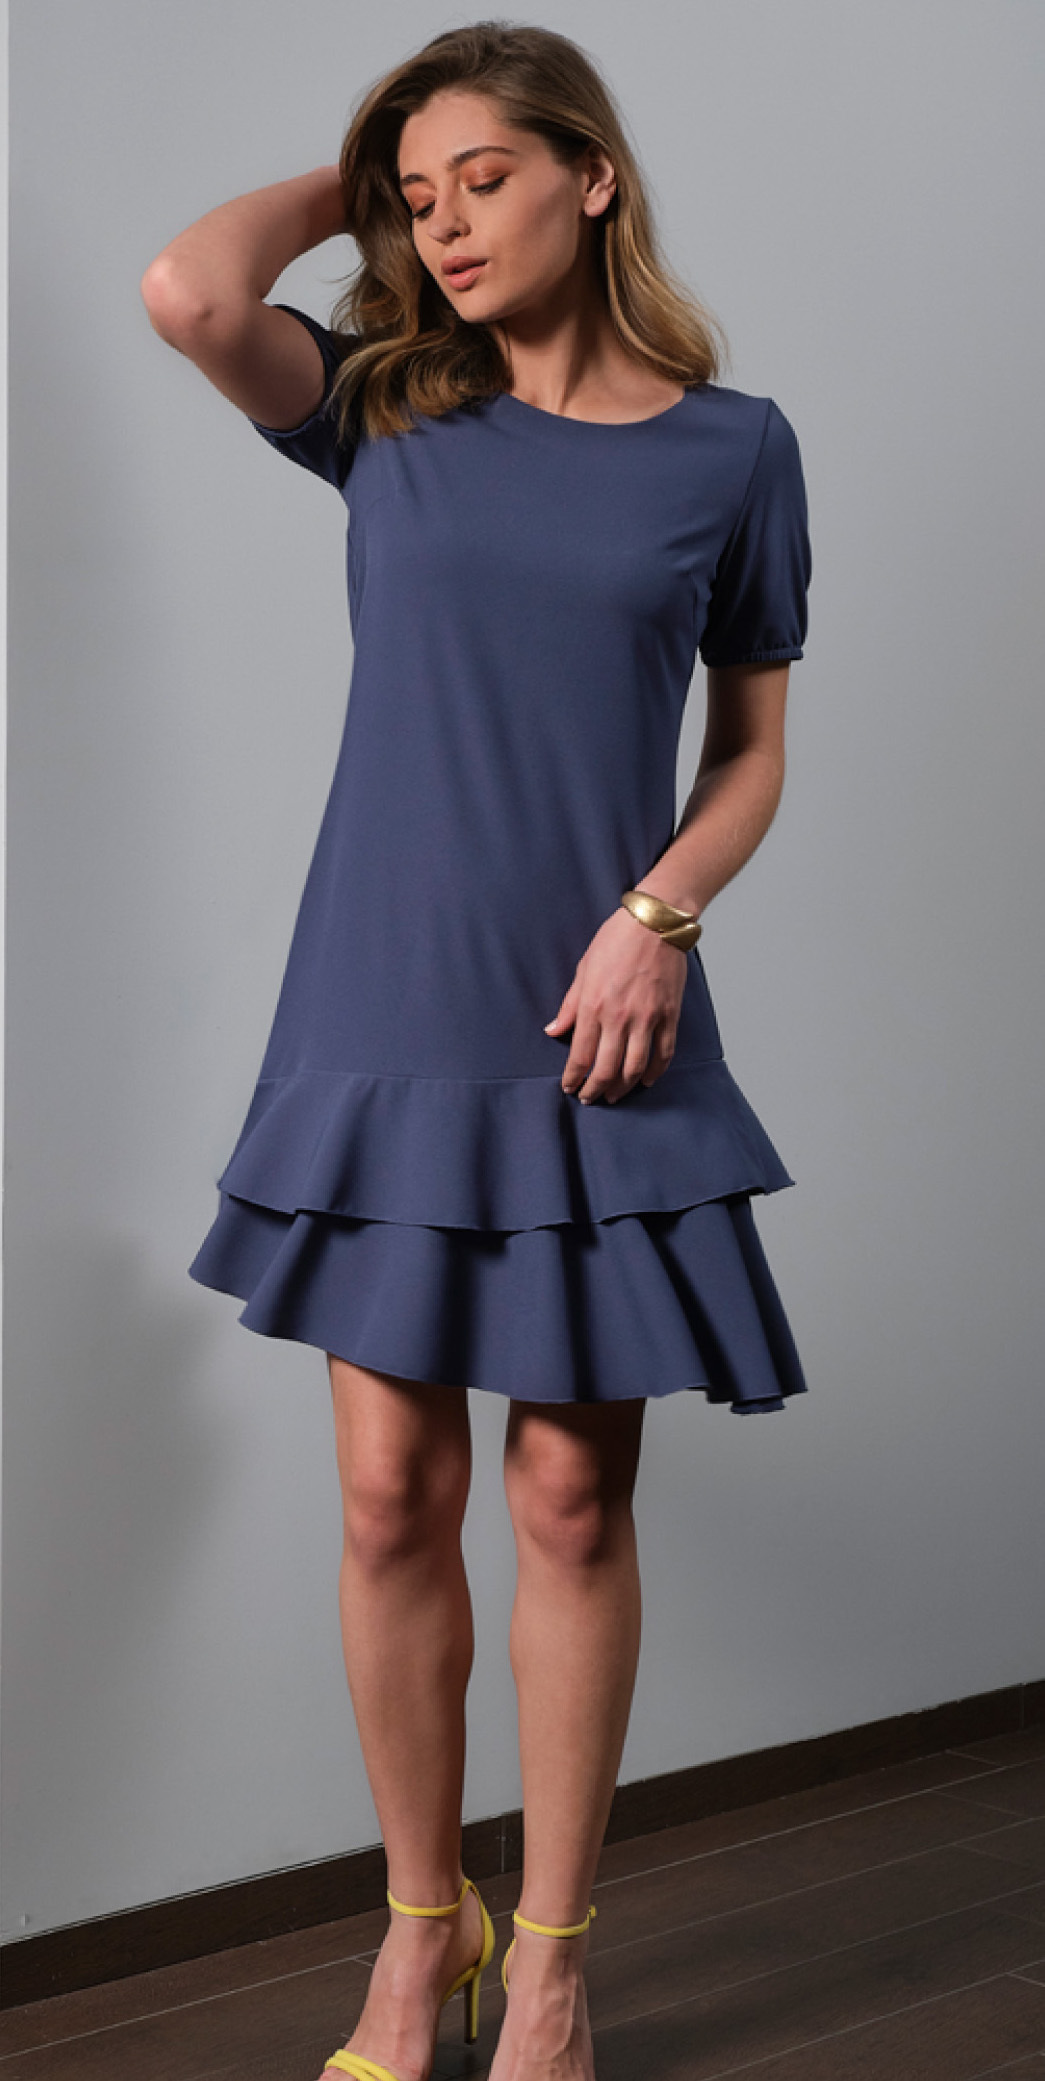 Paul Brial: Sexy Double Ruffle Trouble Asymmetrical Midi Dress (Few Left!) PB_CAROLINE_N1